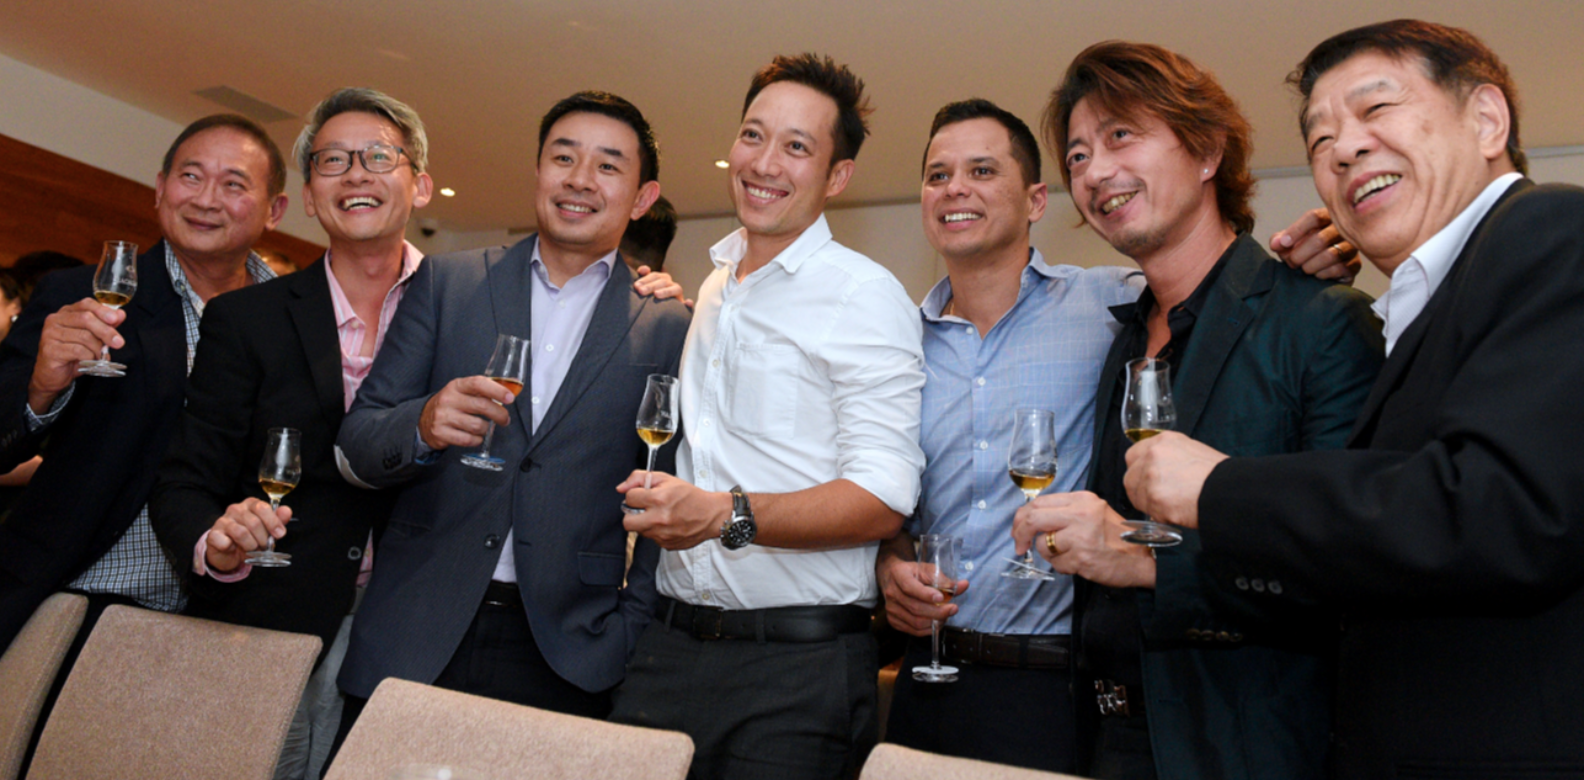 Richard Low, Henry The, Choo Ken-Yi, Andre Huber, Andre Cherbonnier, Kimihisa Abe, Tan Kong King